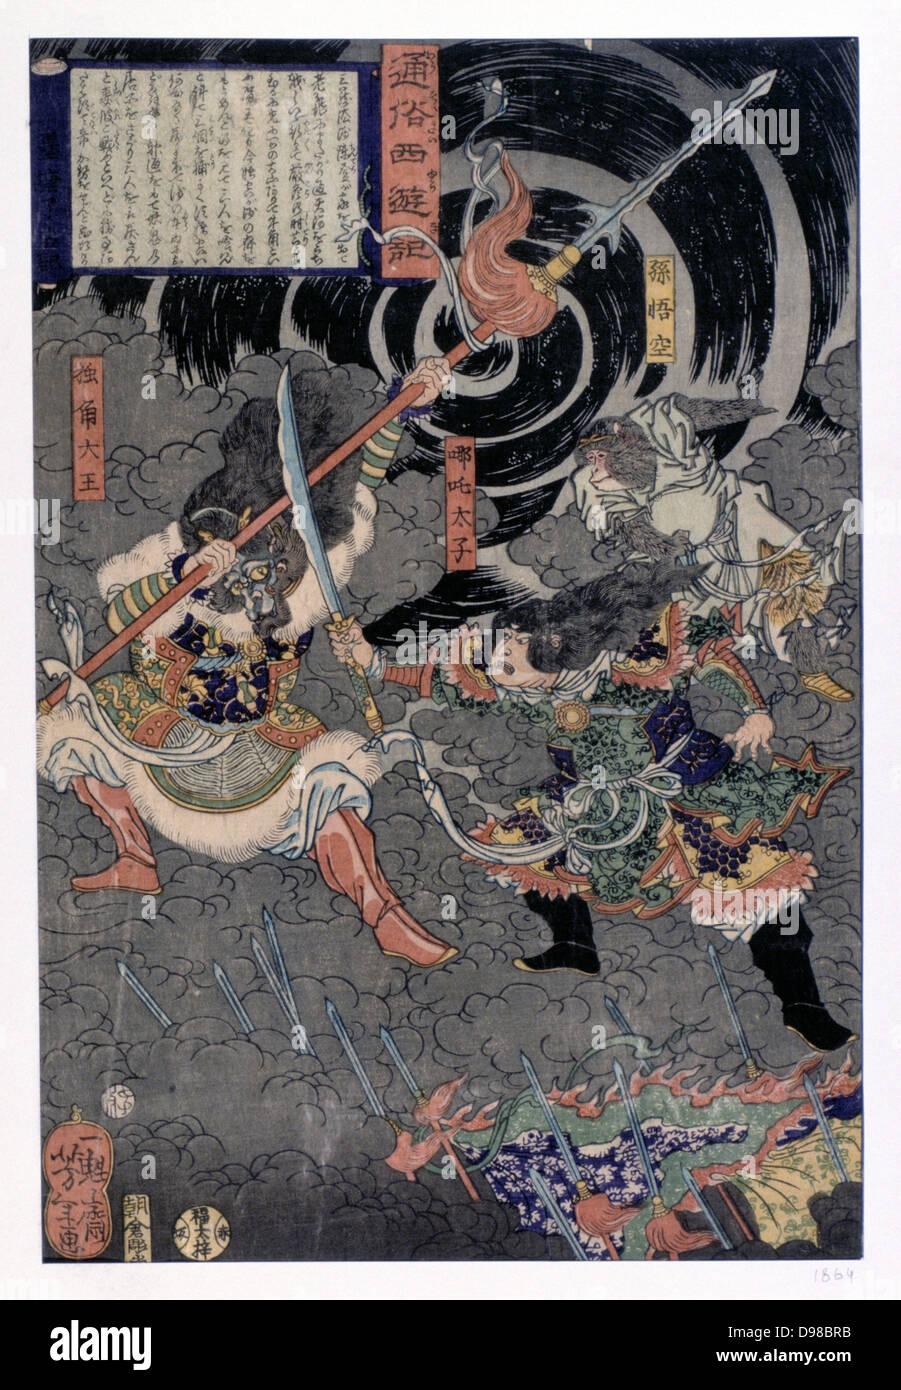 Samurai warrior in battle against monkeys.Nineteenth century Japanes coloured woodblock print. - Stock Image